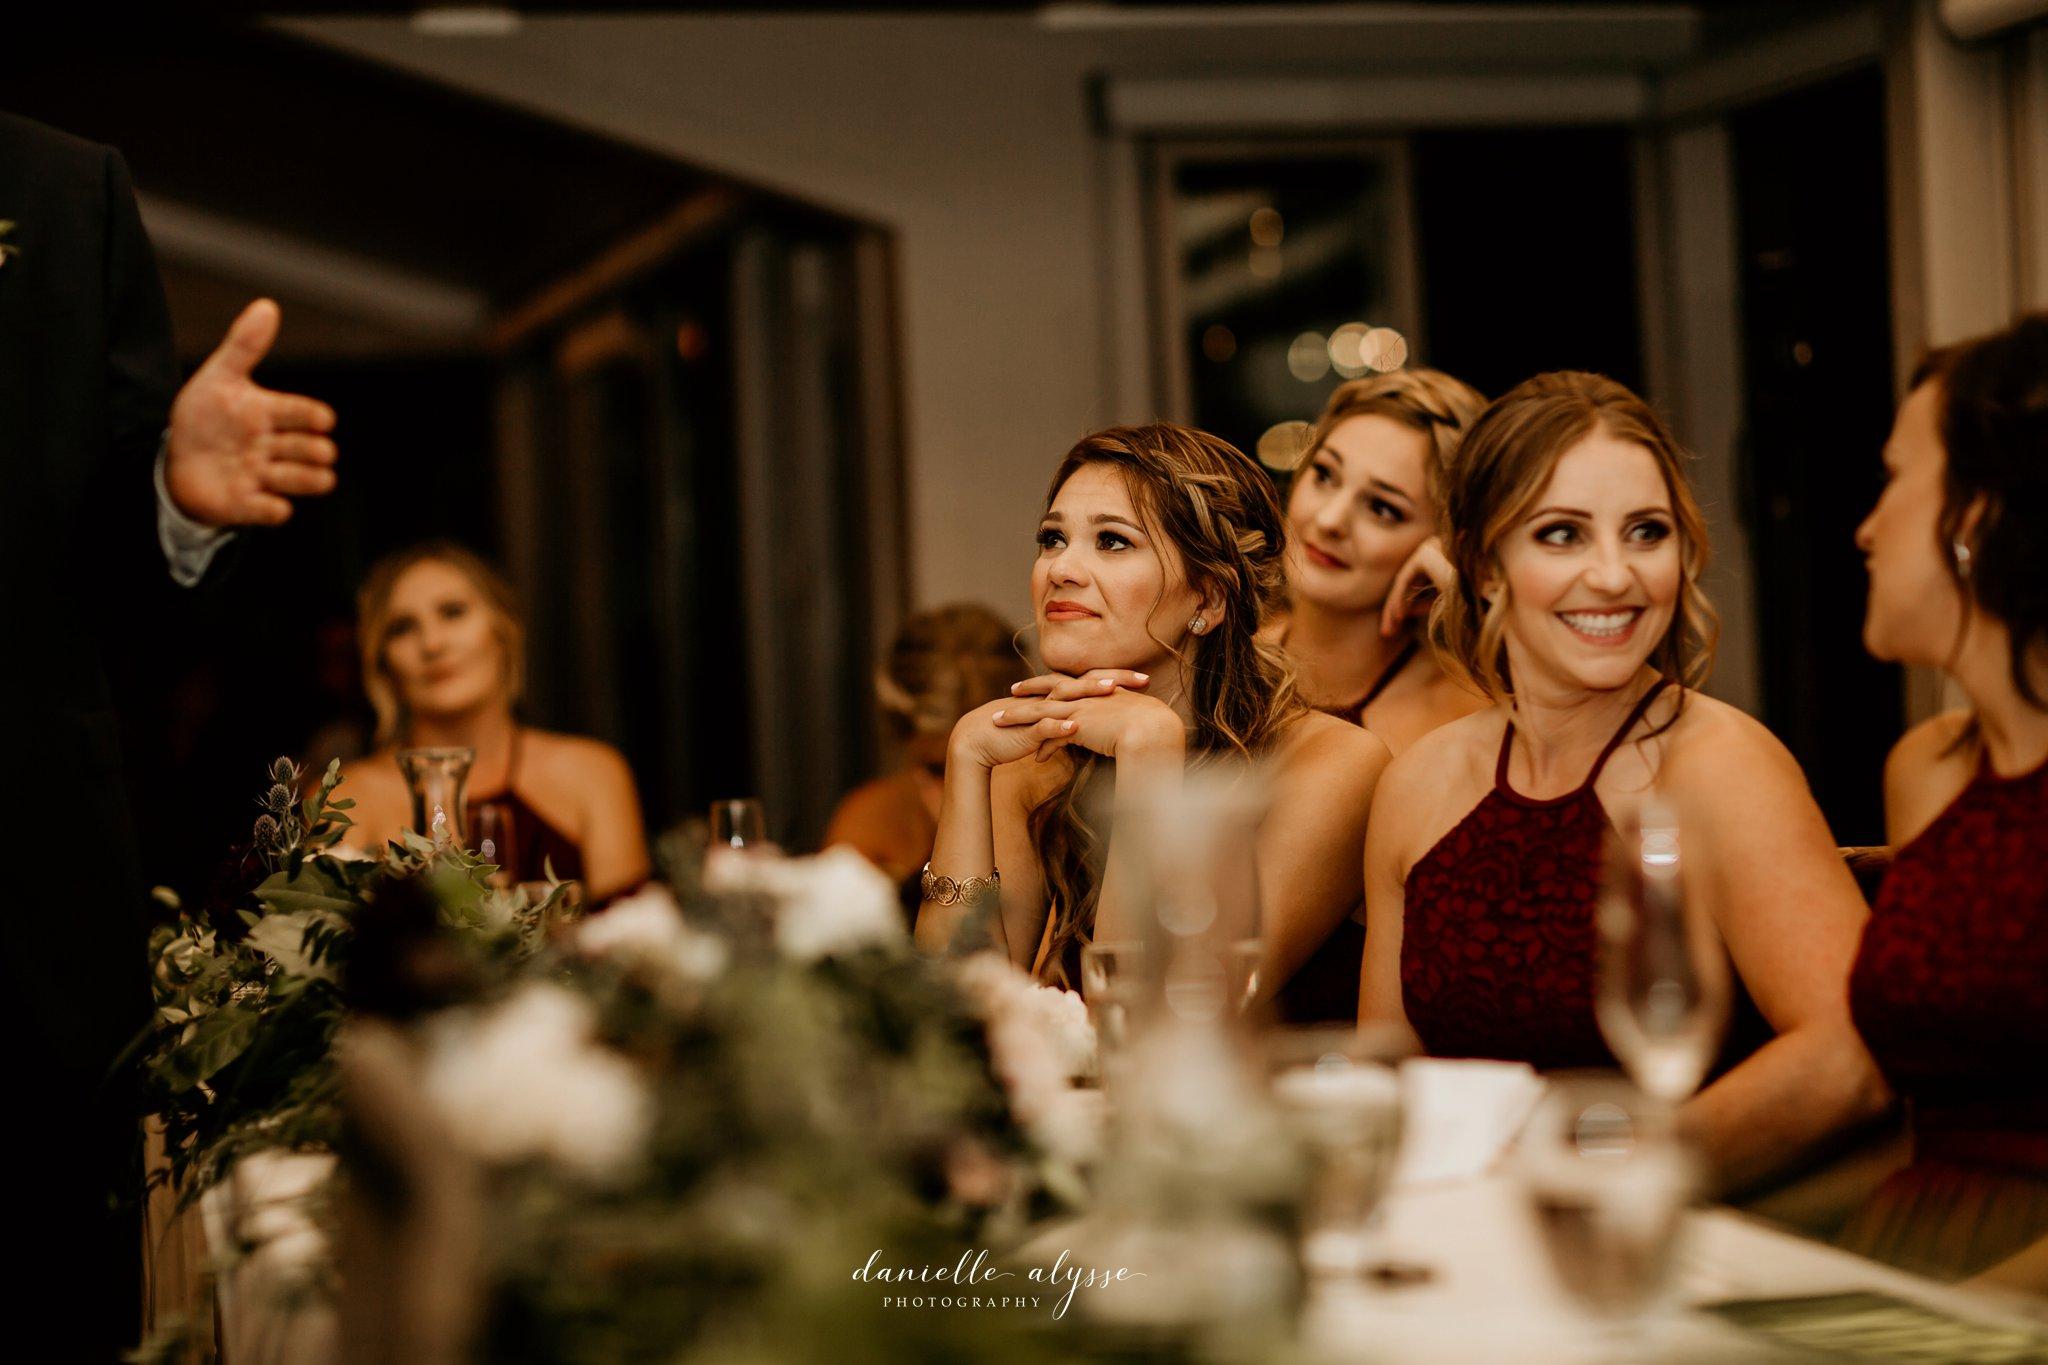 180831_wedding_stephanie_heavenly_south_lake_tahoe_danielle_alysse_photography_destination_blog_1148_WEB.jpg